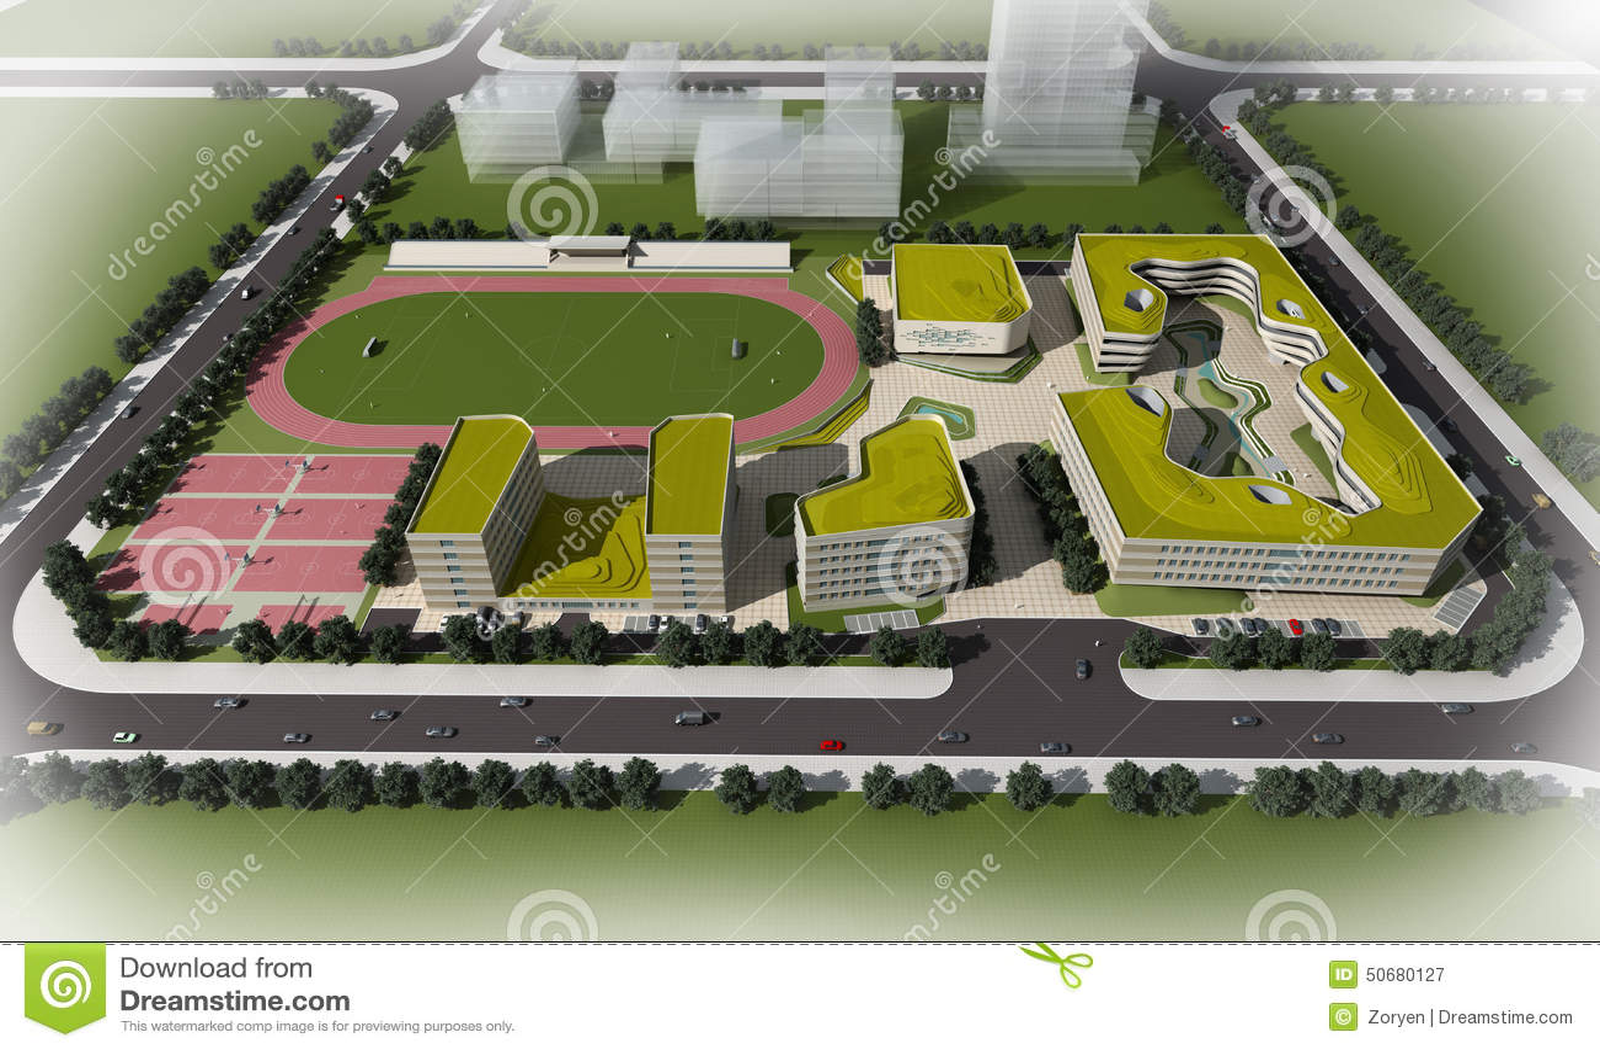 Download 一所现代学校的计划 库存图片. 图片 包括有 设计, 尺寸, 体育运动, 说明, 绿色, 间距, 学校, 跟踪 - 50680127